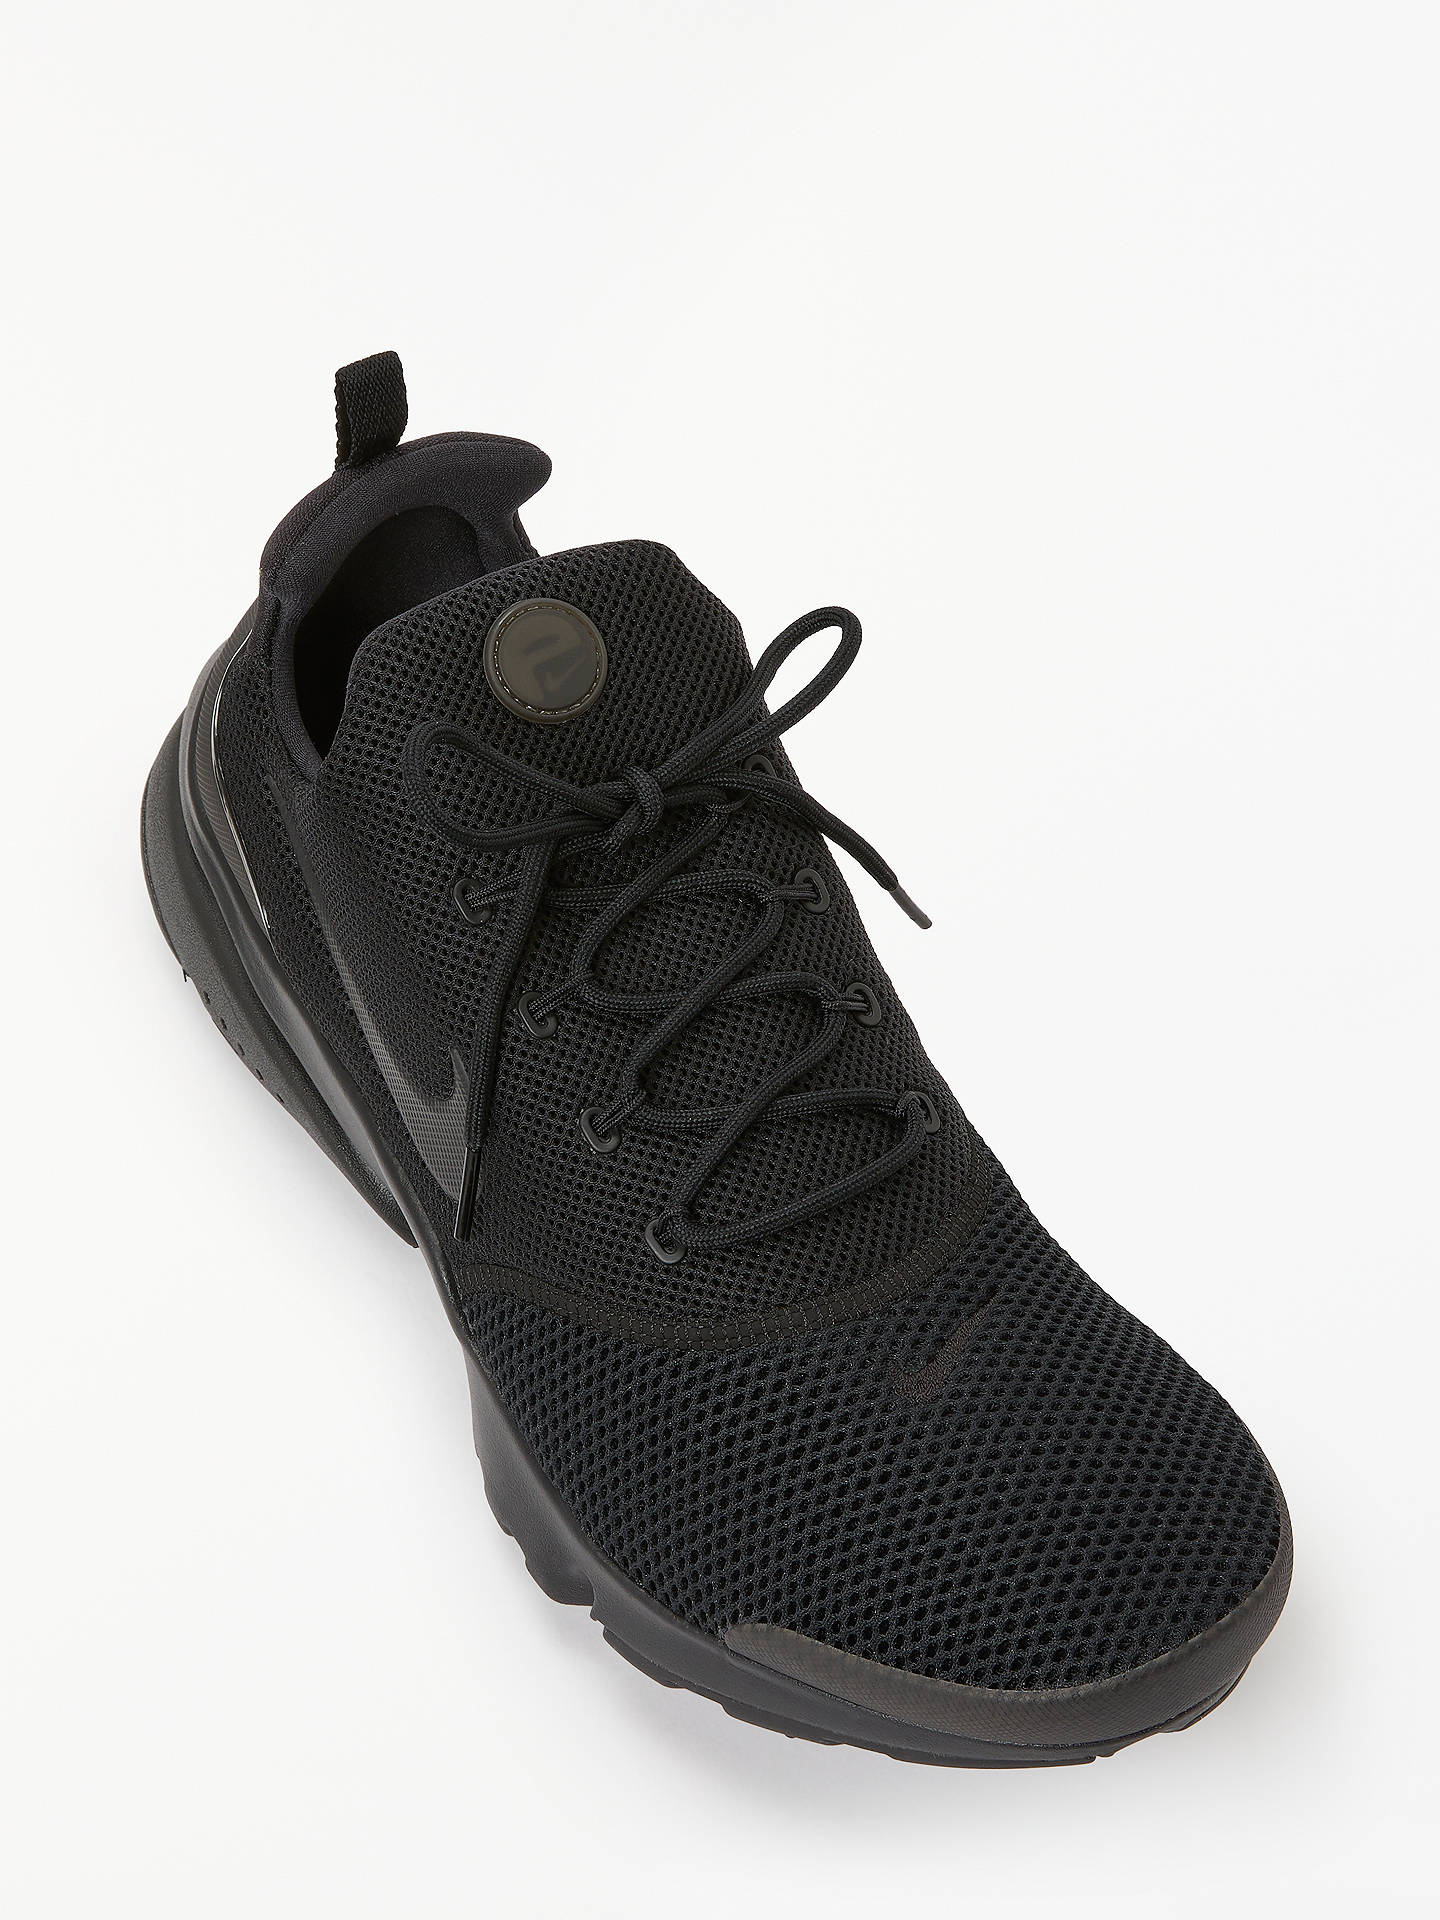 Nike Presto Fly Men's Trainers, Black at John Lewis & Partners